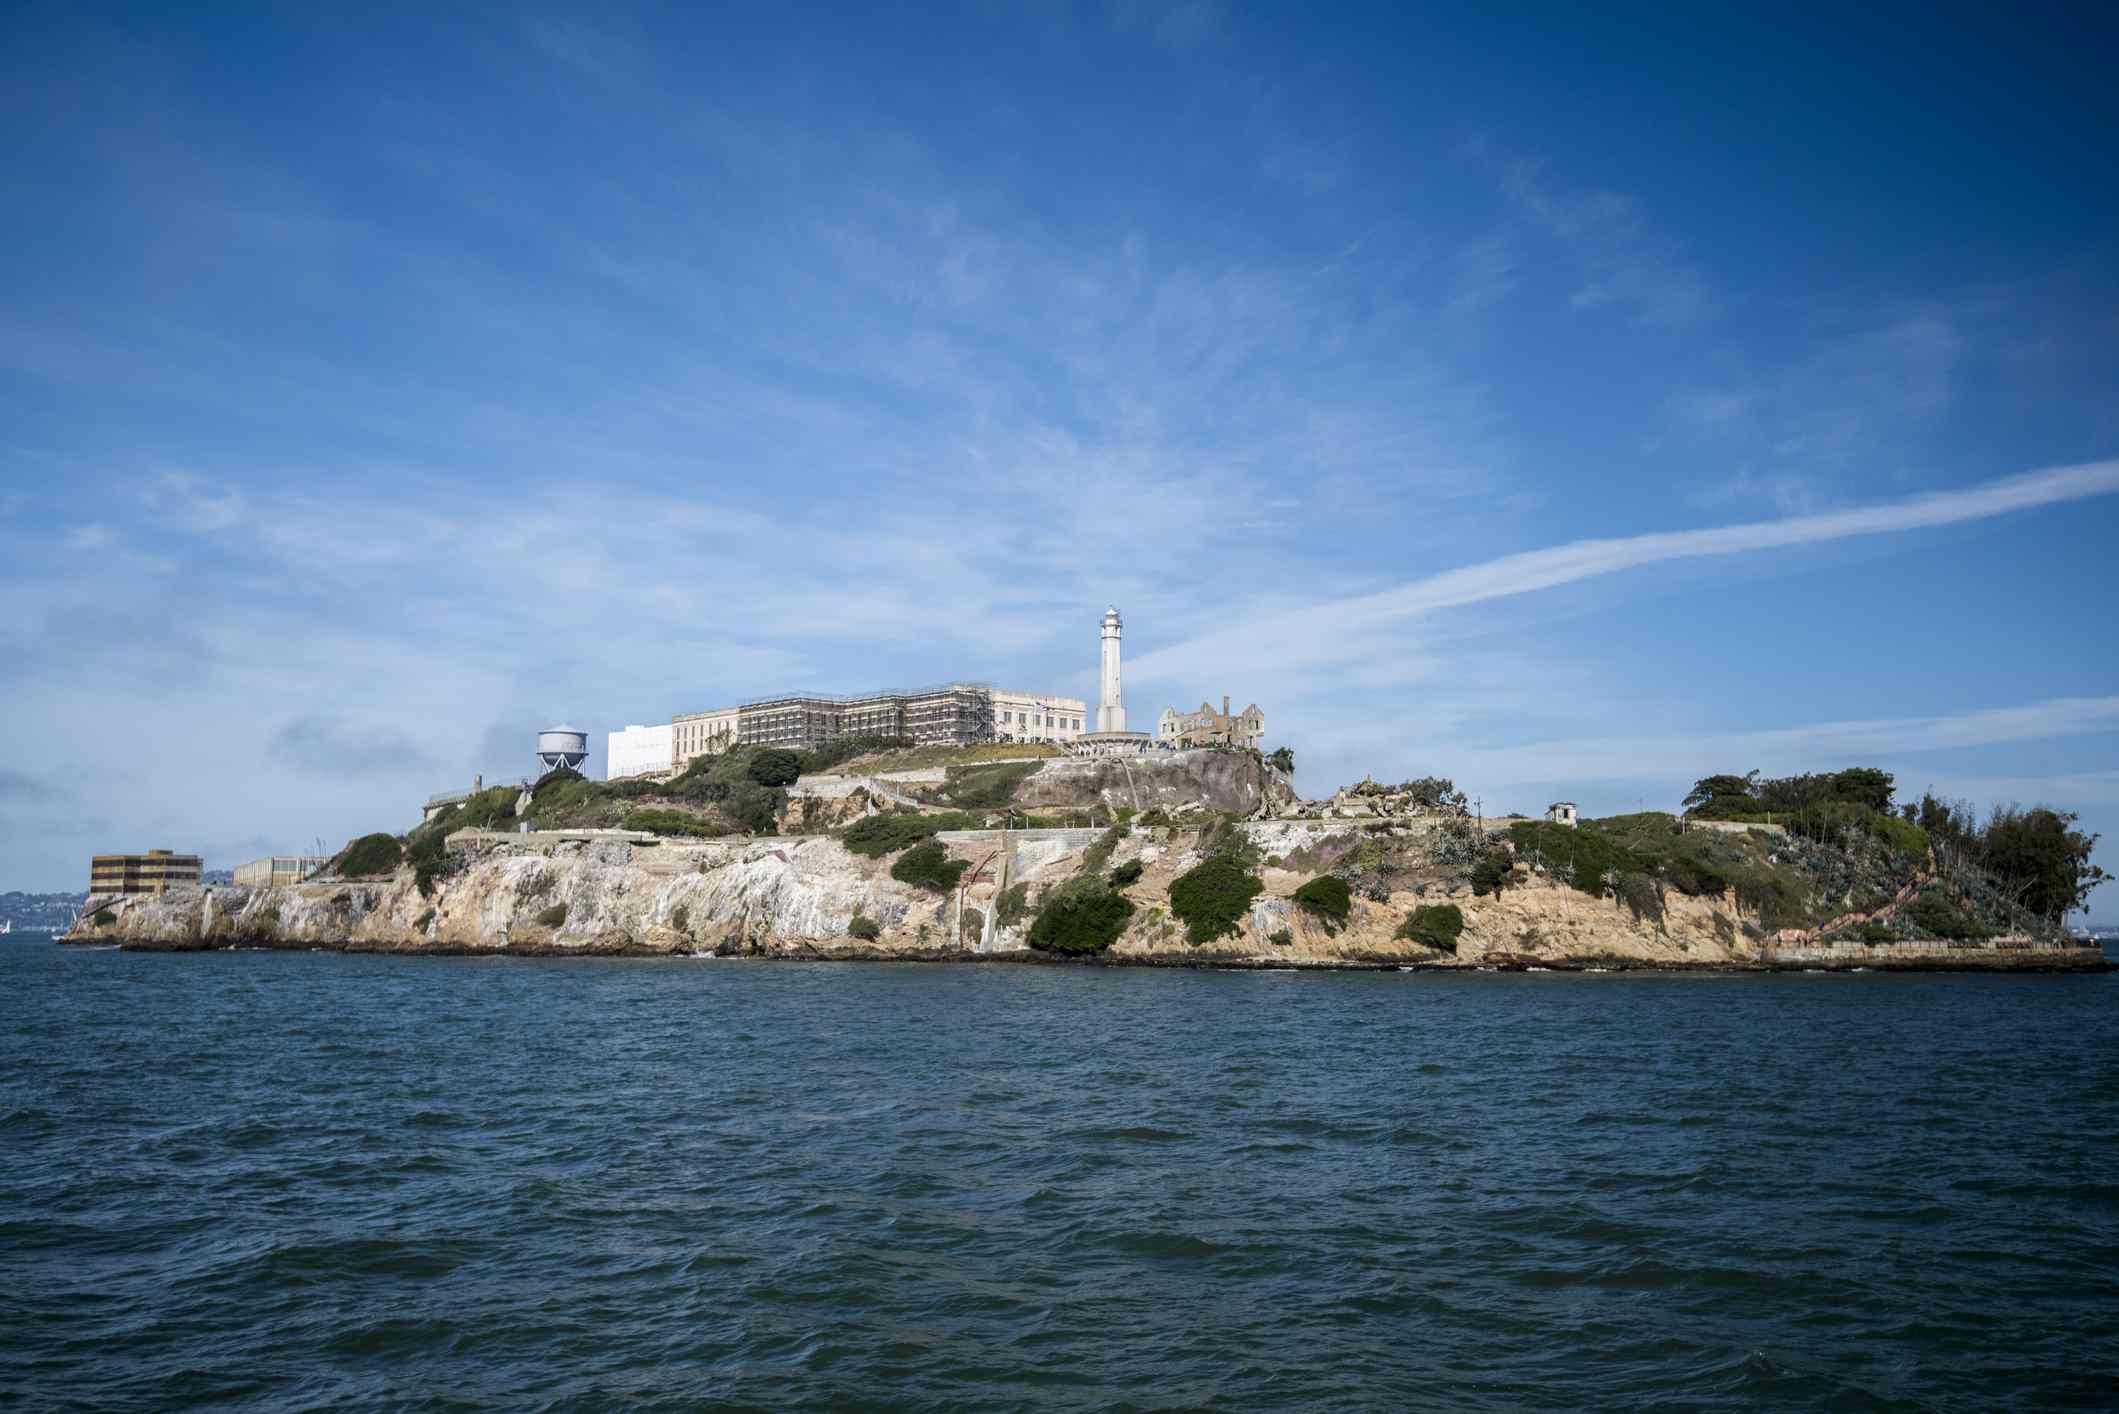 Alcatraz Island in San Francisco, California